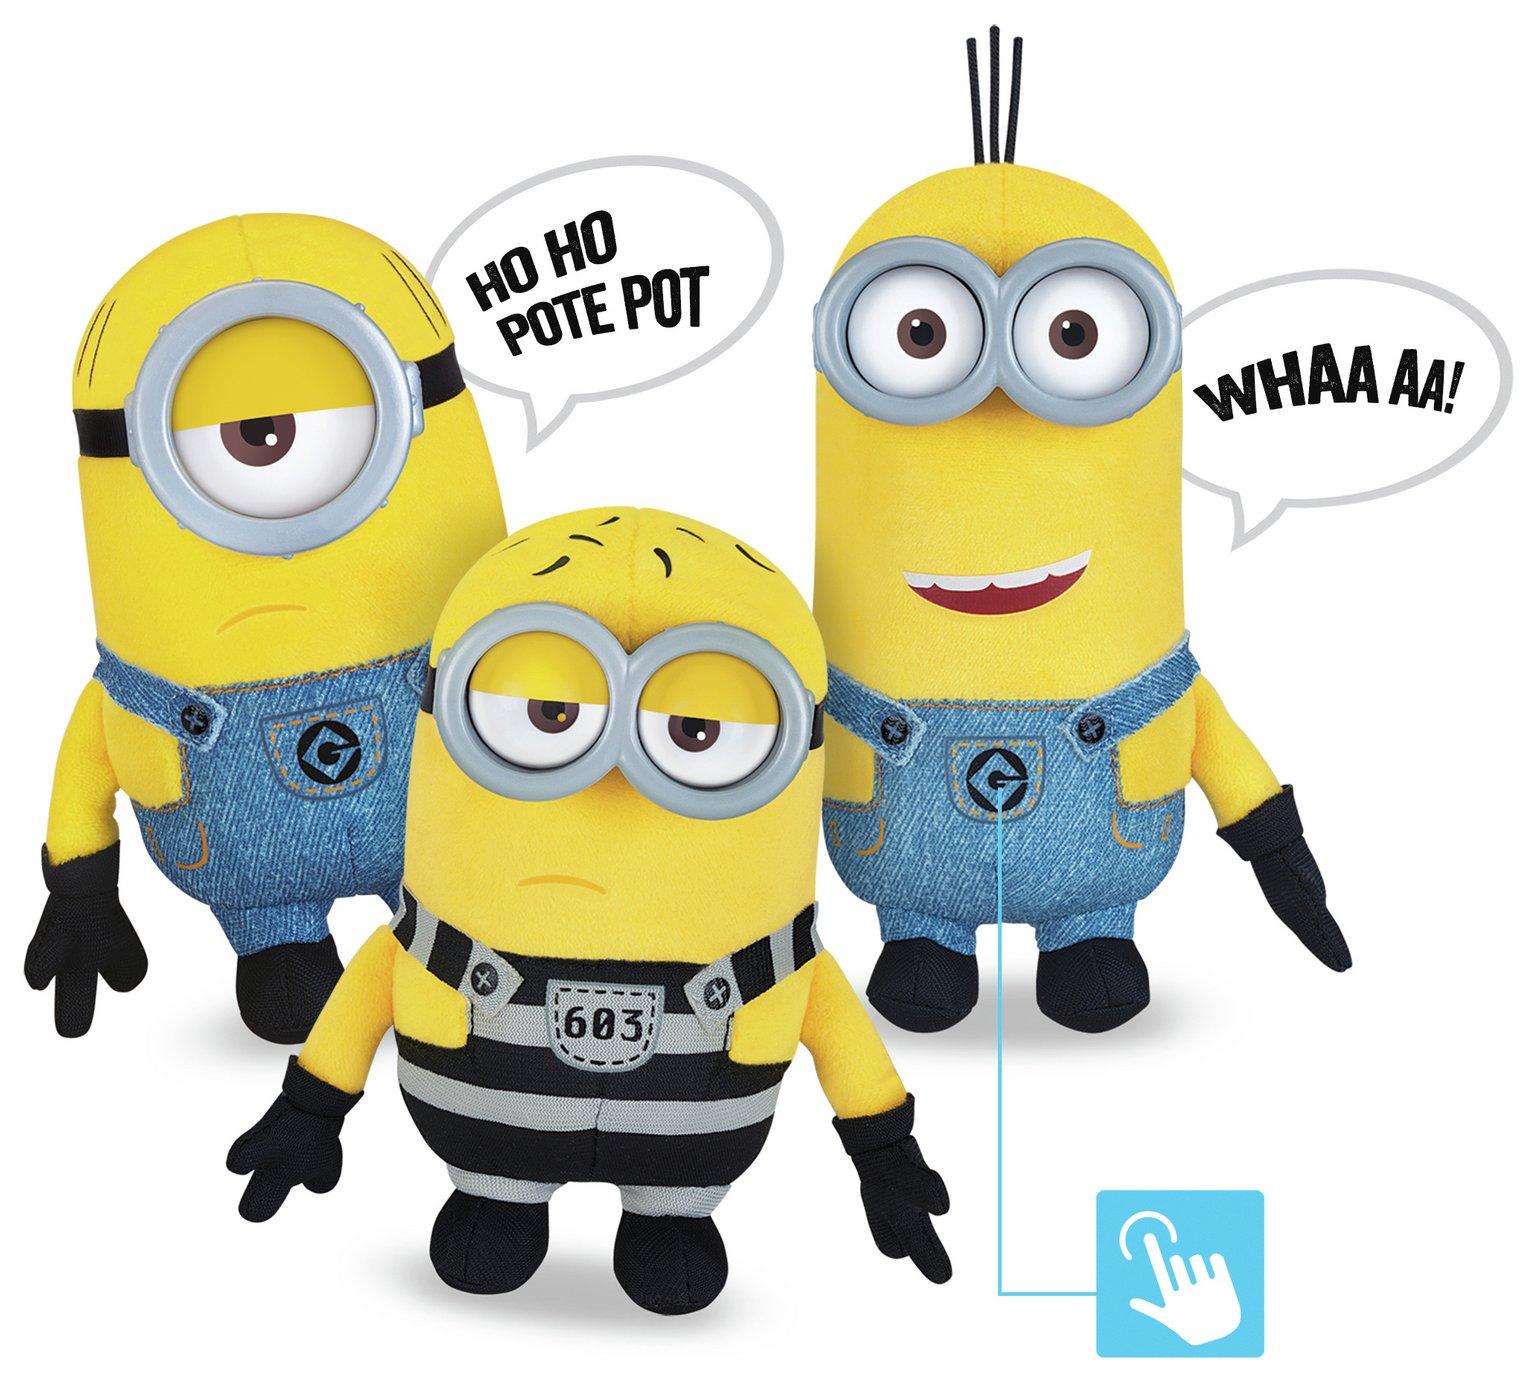 Talking Minions Despicable Me 3 Plush Buddies - £2.49 @ Argos (Free C&C)